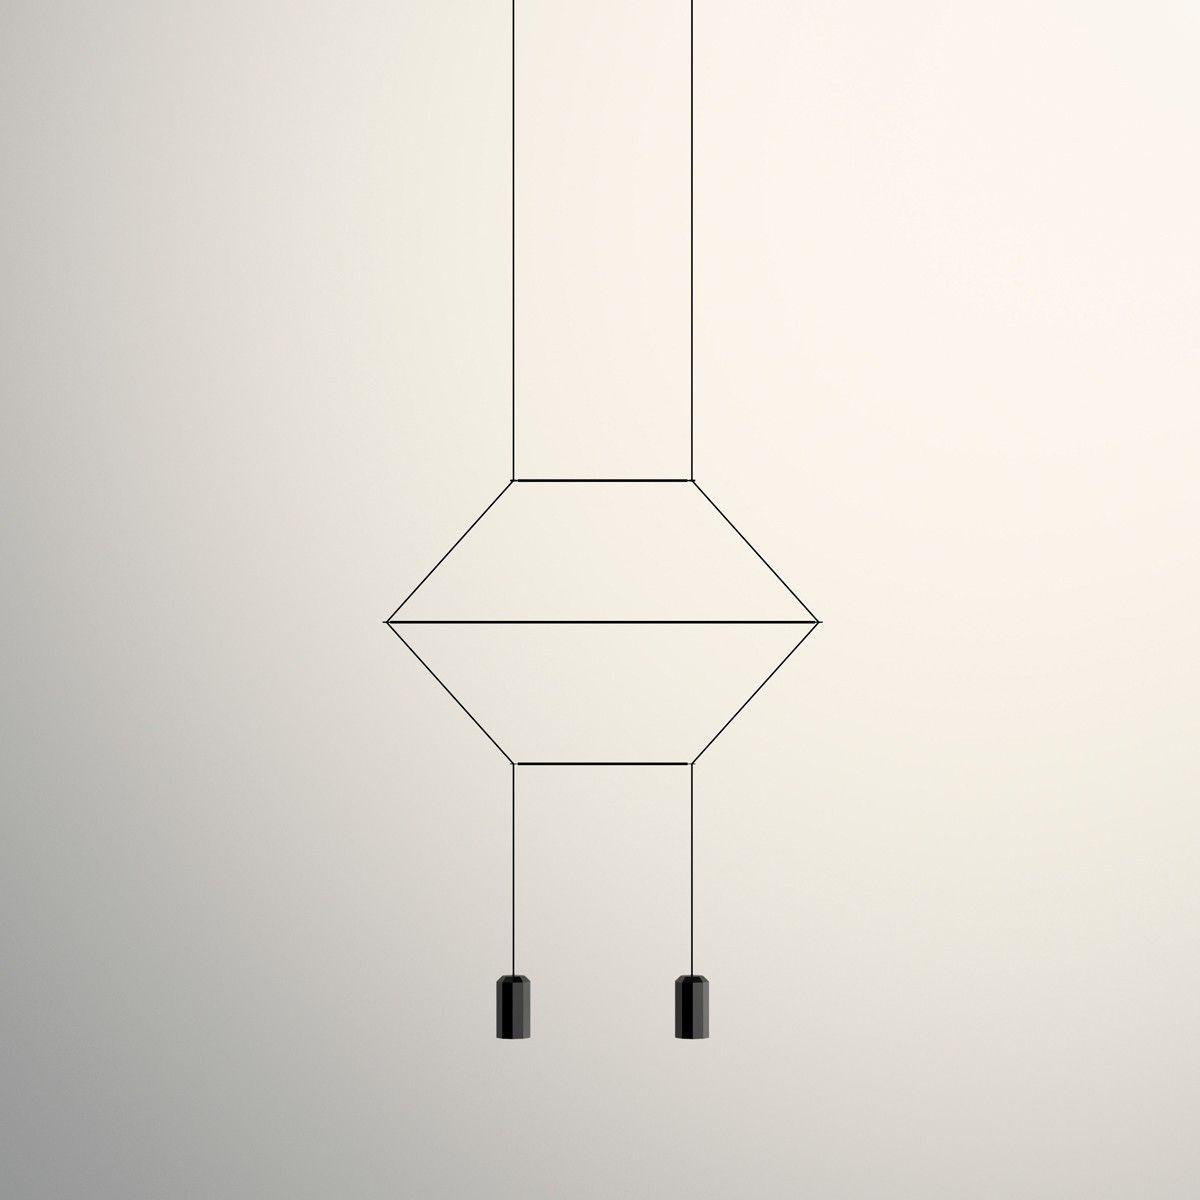 Vibia Wireflow Pendelleuchte Linear 2 Flg Schwarz Mit Bildern Pendelleuchte Leuchten Hangeleuchte